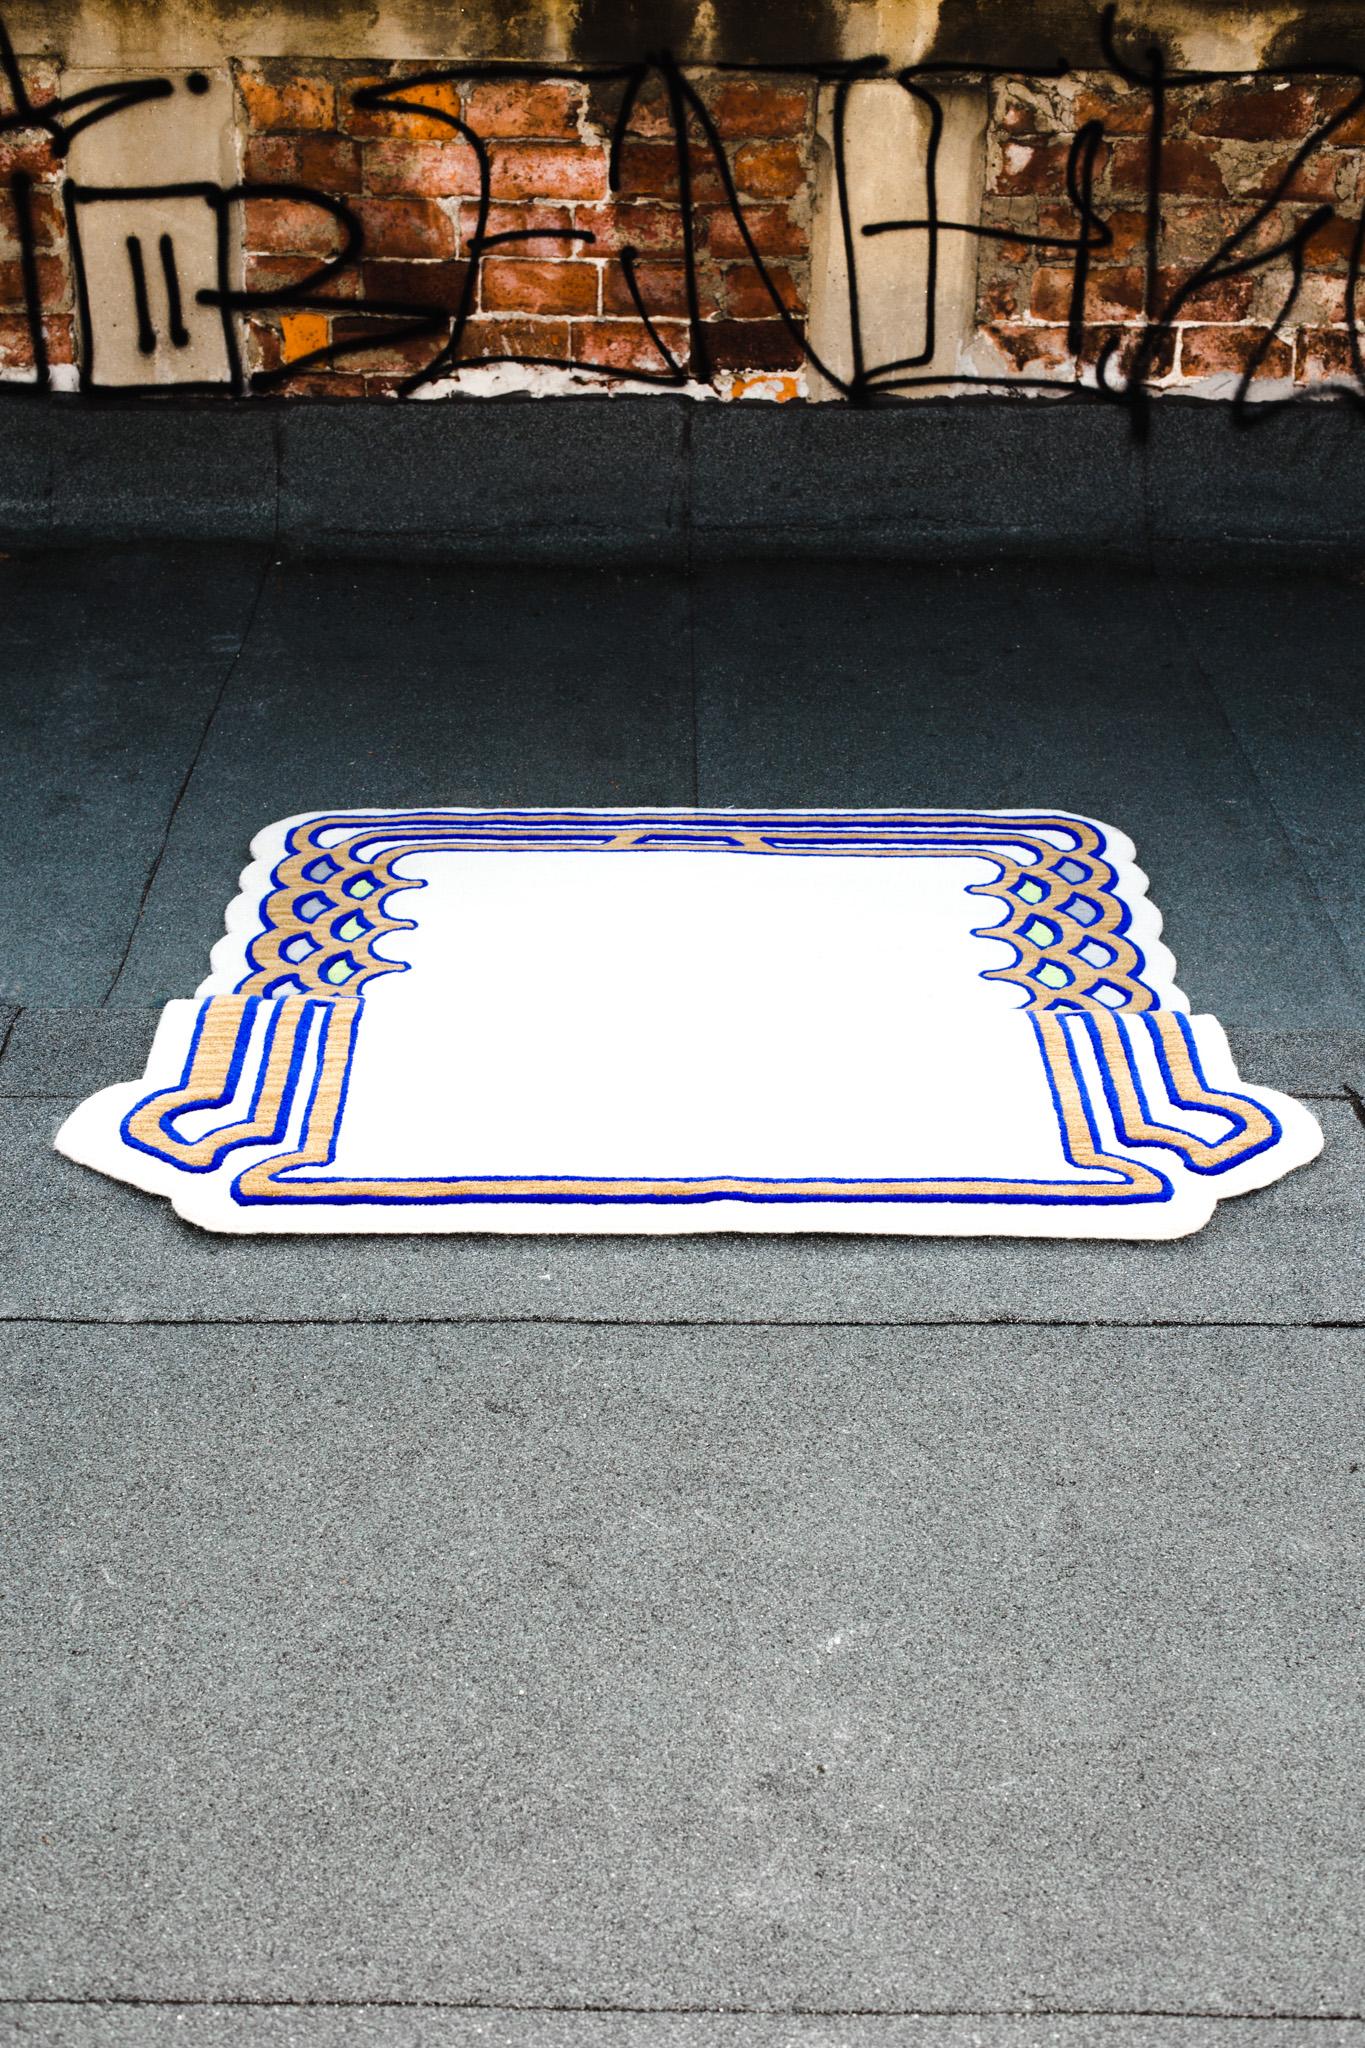 alan-tamir-t.a.z.-mania-rugs-1.jpg